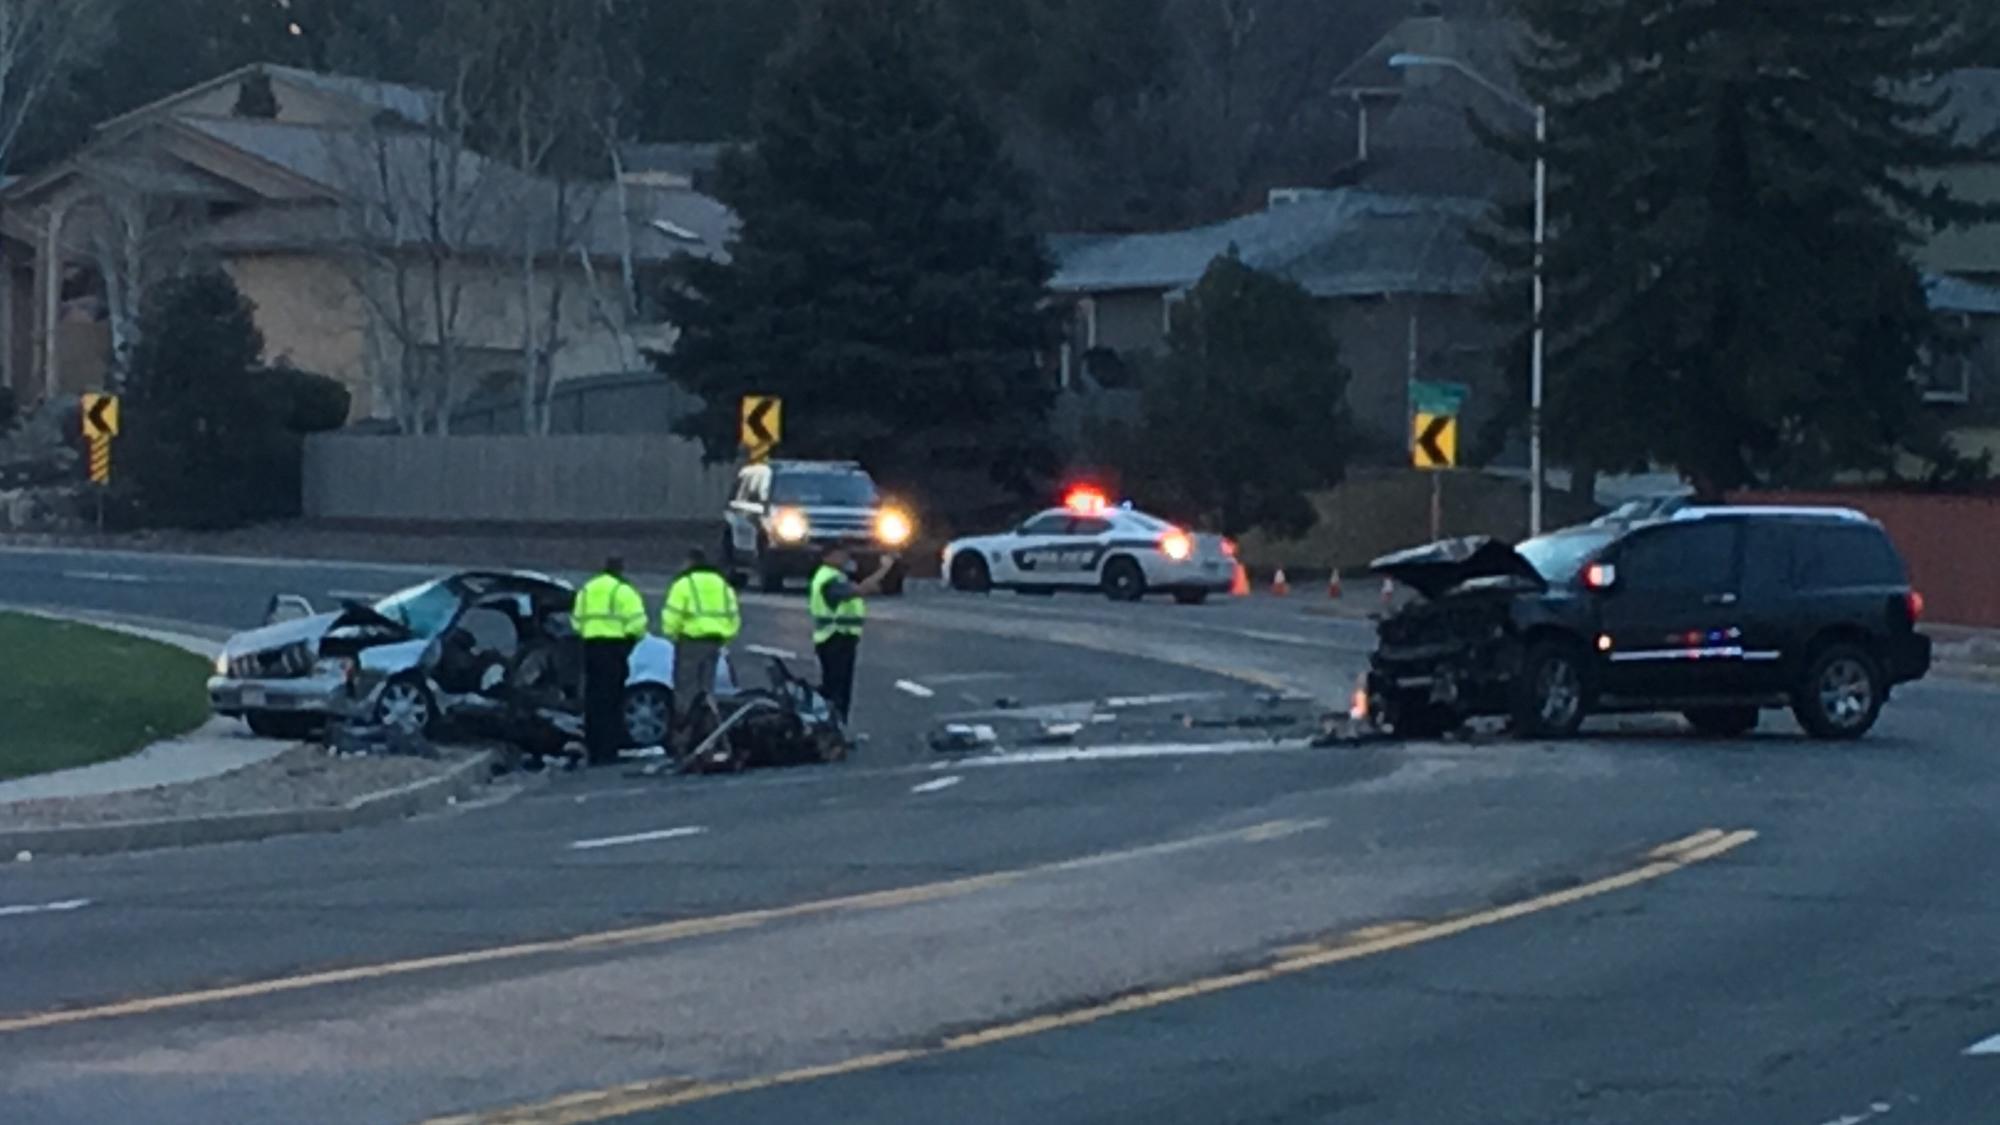 Police investigate a crash on Maizeland Road in central Colorado Springs Wednesday morning. Paula Buck - FOX21 News